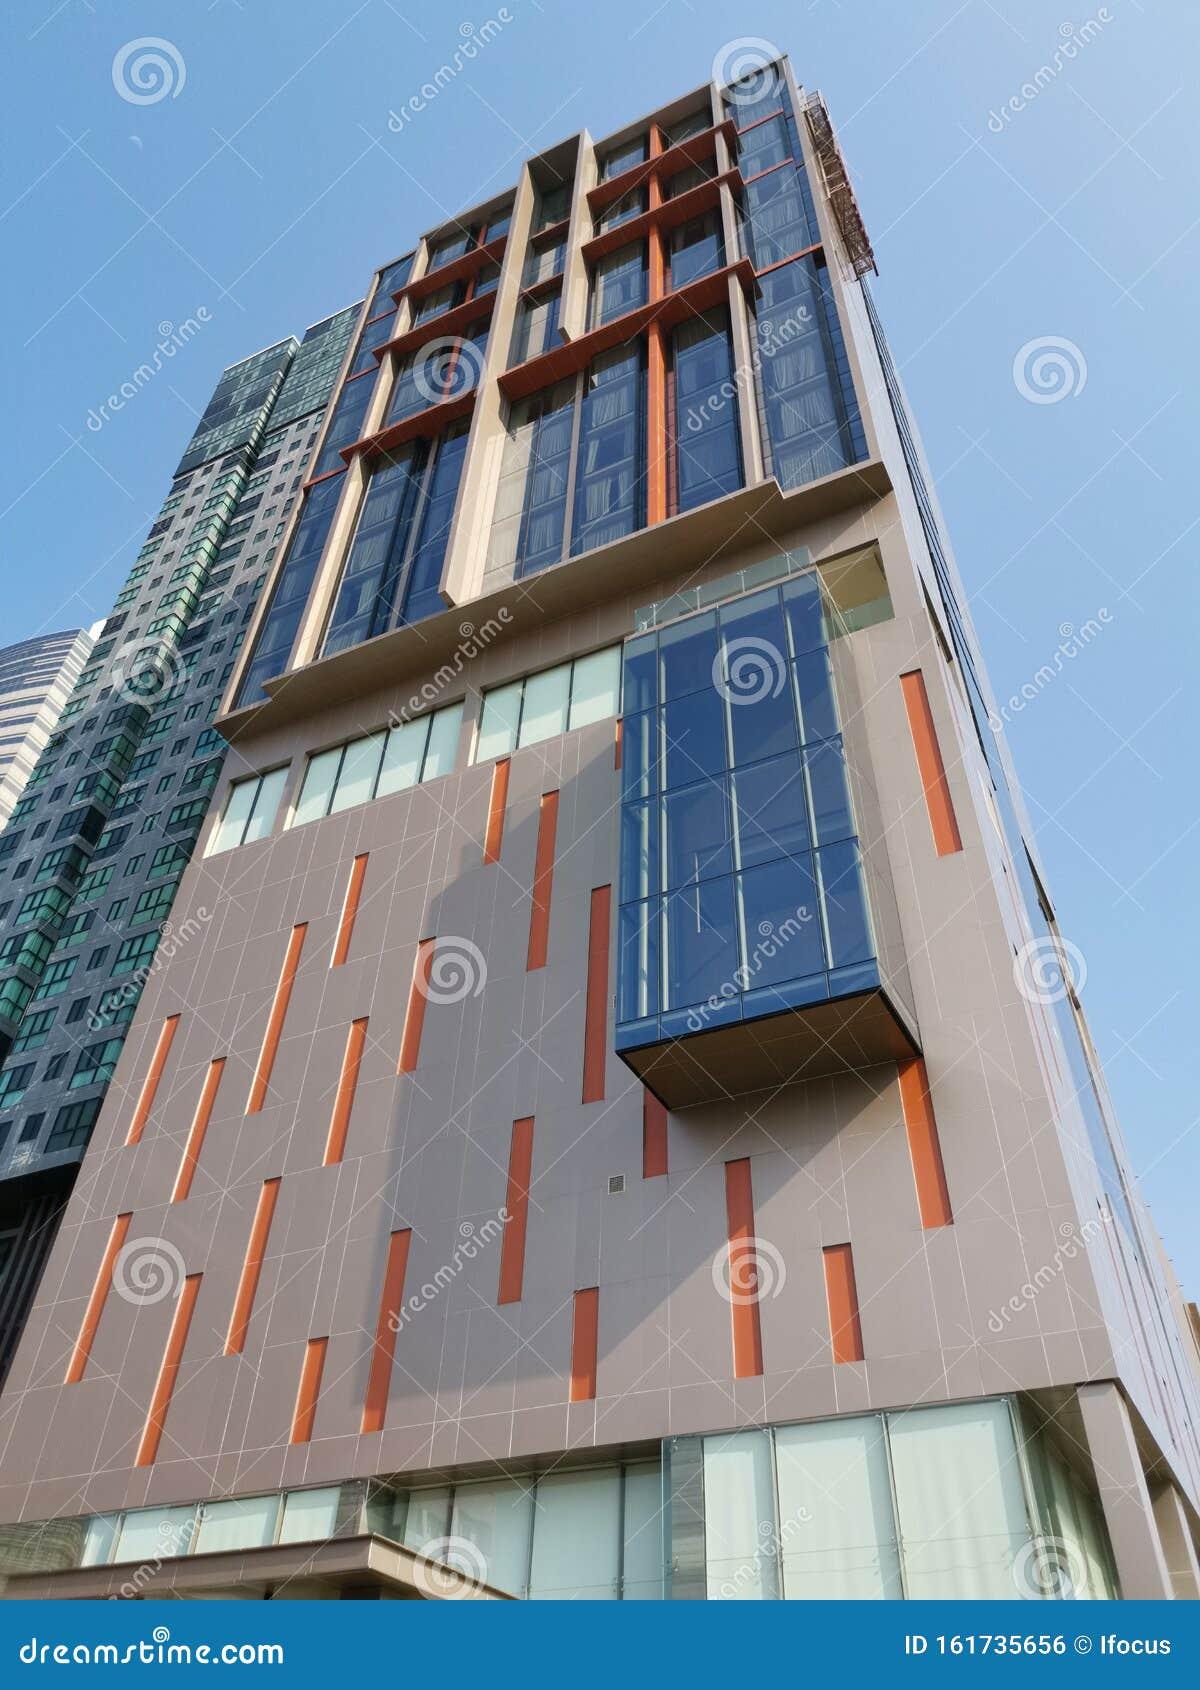 Best Western Plus Wanda Grand Hotel Soars Into Blue Sky Editorial Photo Image Of High Pakkret 161735656